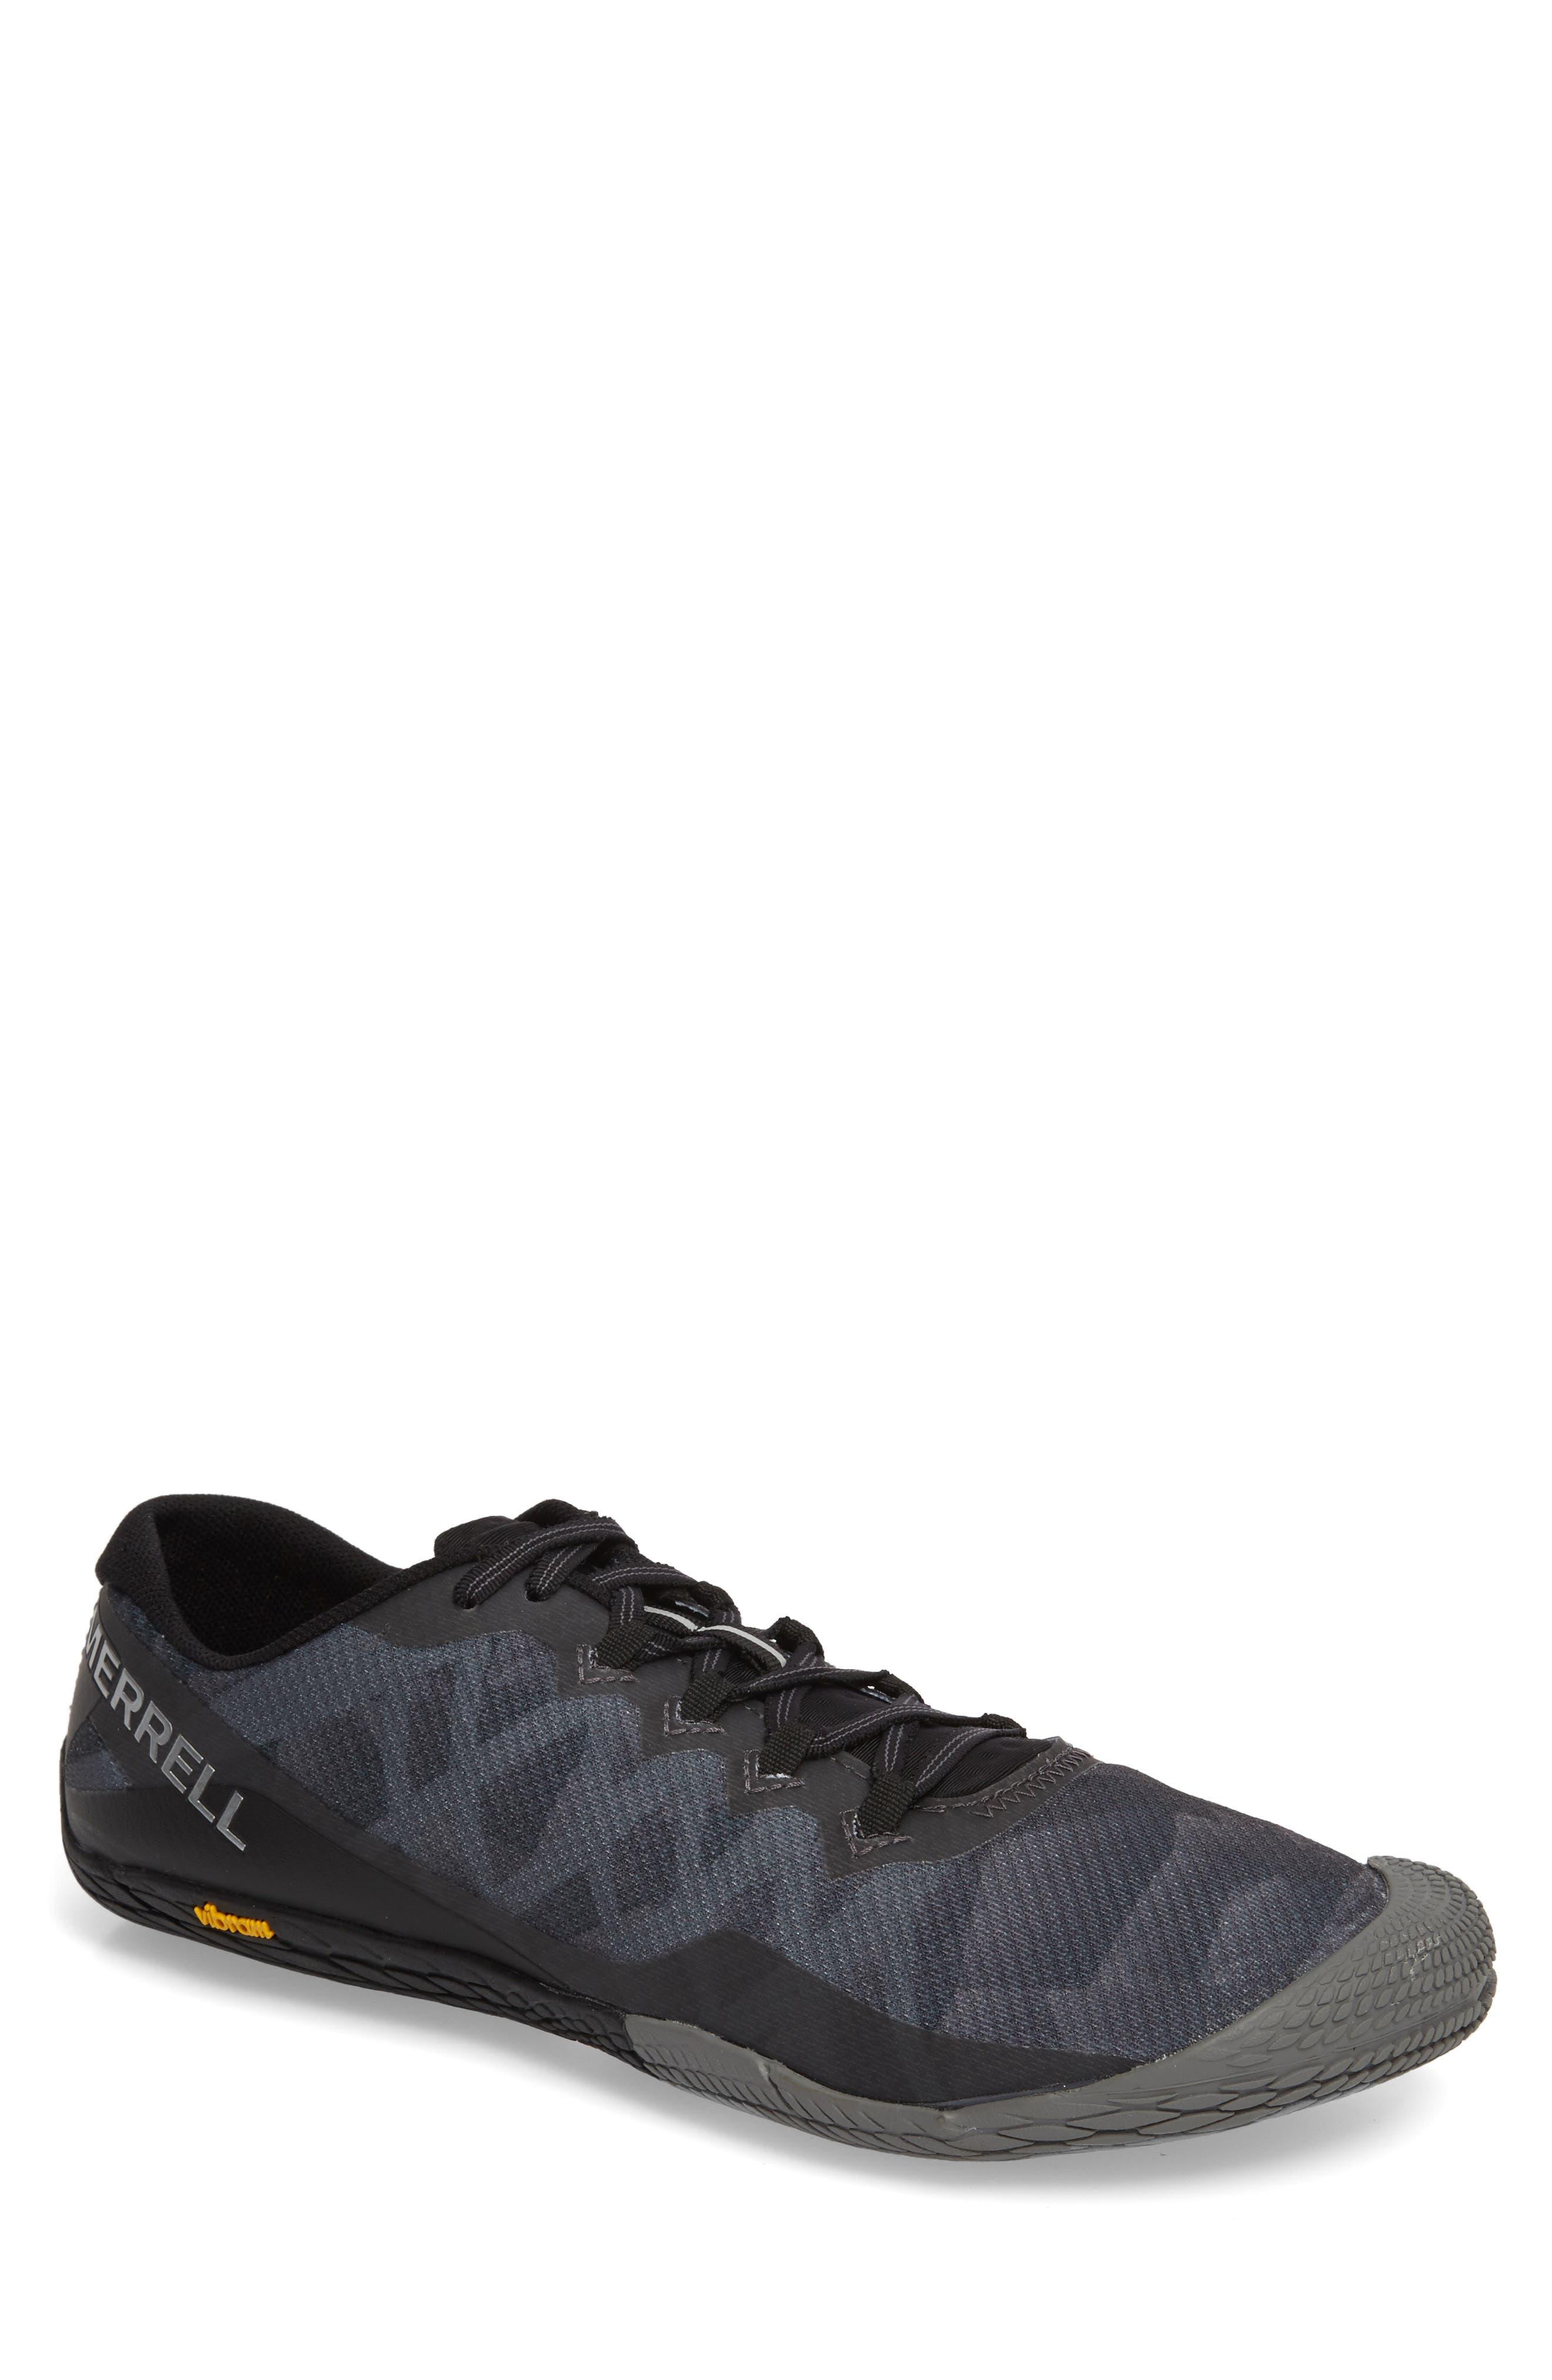 Vapor Glove 3 Trail Running Shoe,                         Main,                         color, BLACK/ SILVER